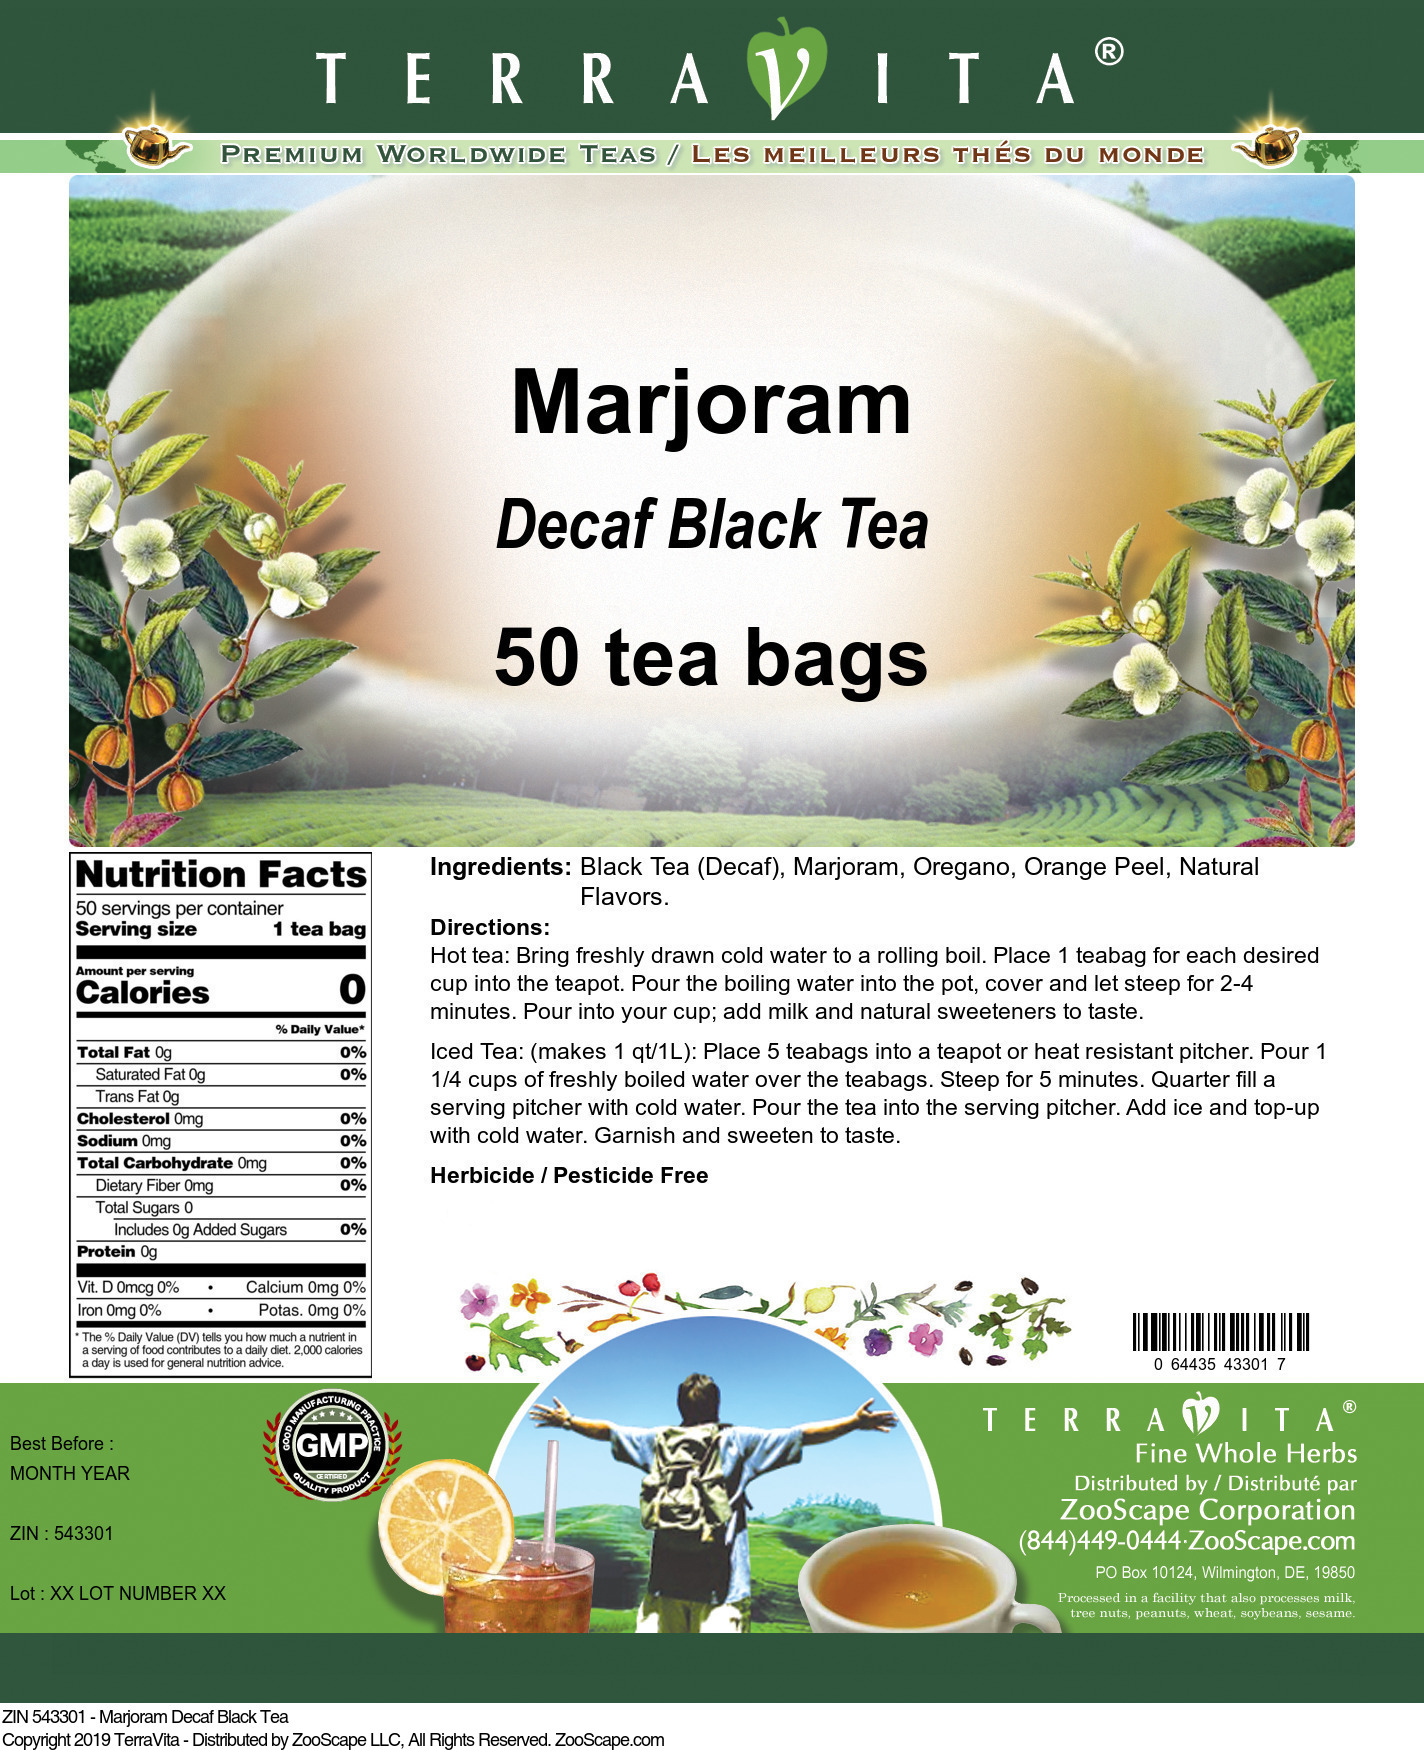 Marjoram Decaf Black Tea